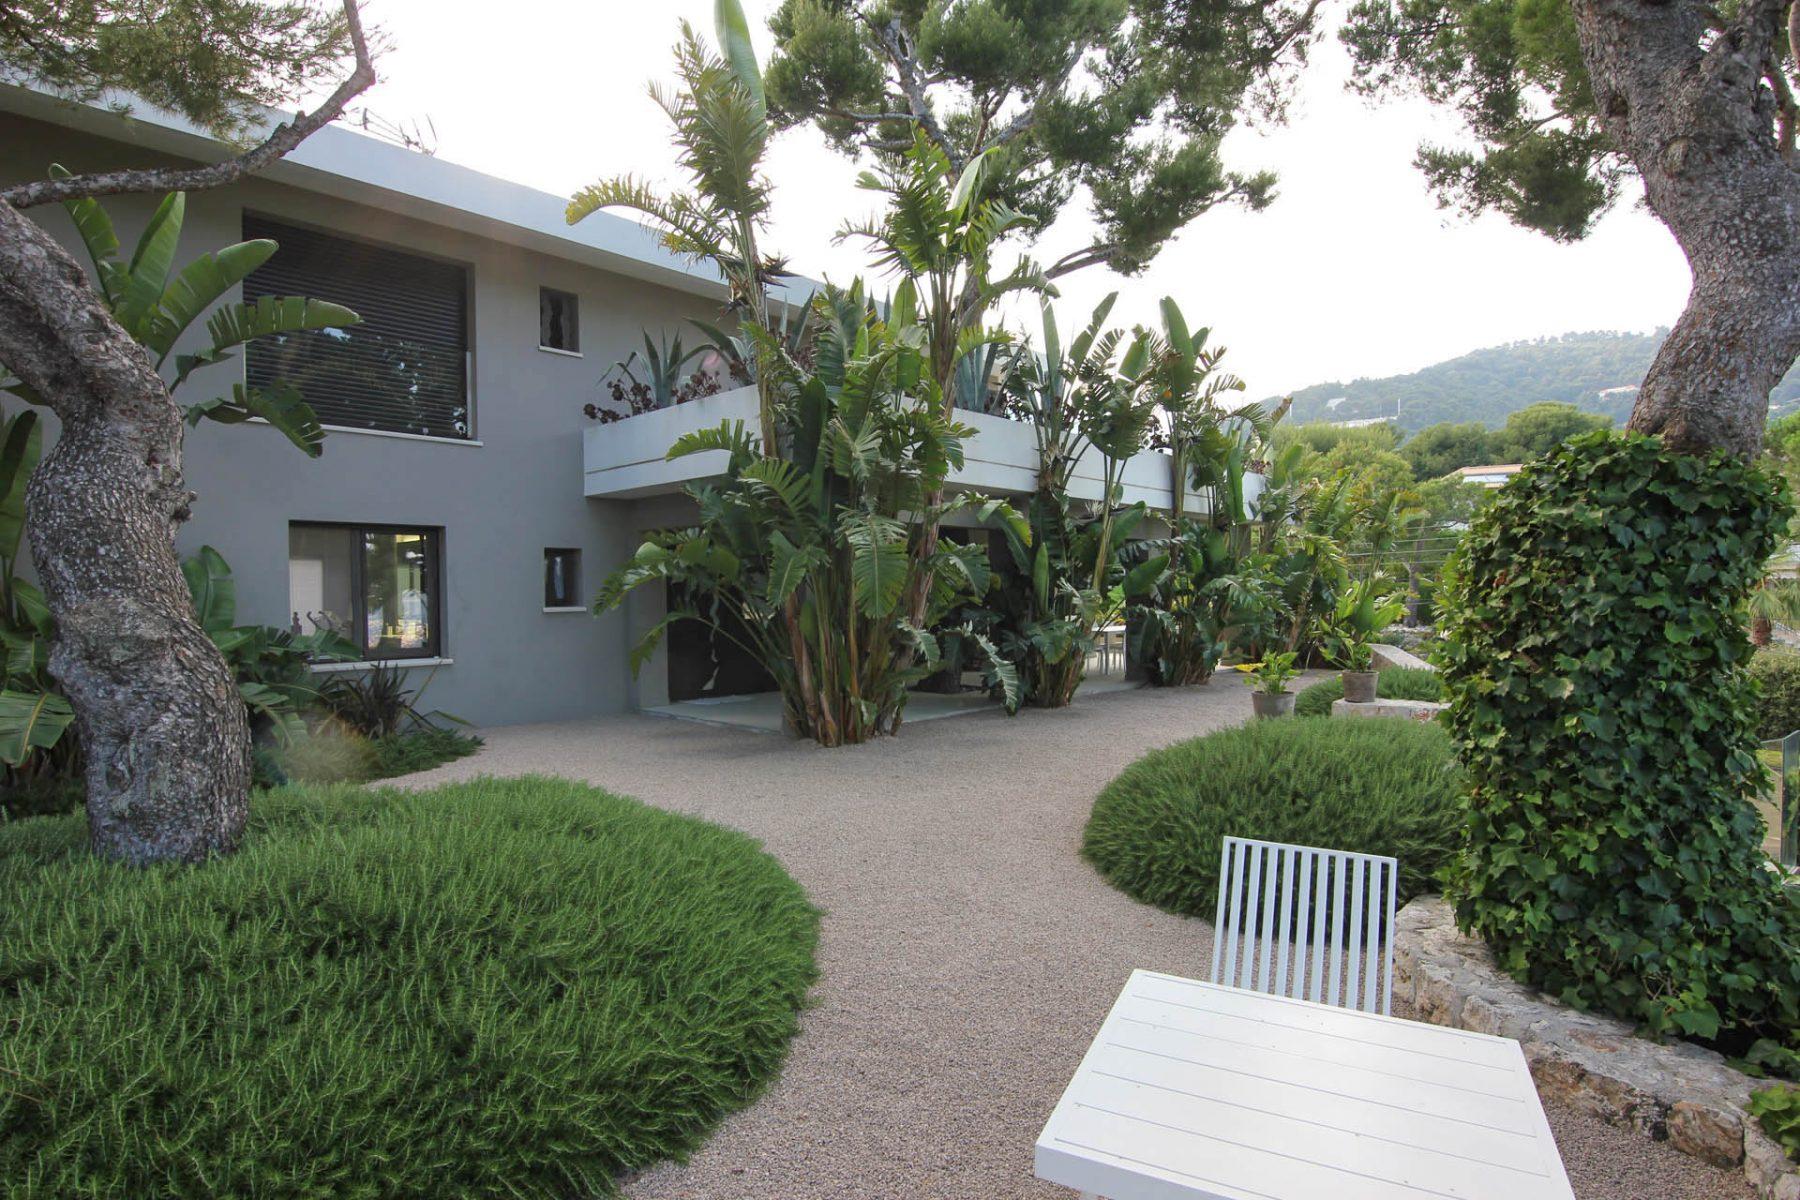 Narmino Jardins, A Versatile Company For Your Green Spaces ... encequiconcerne Les Jardins Des Villas